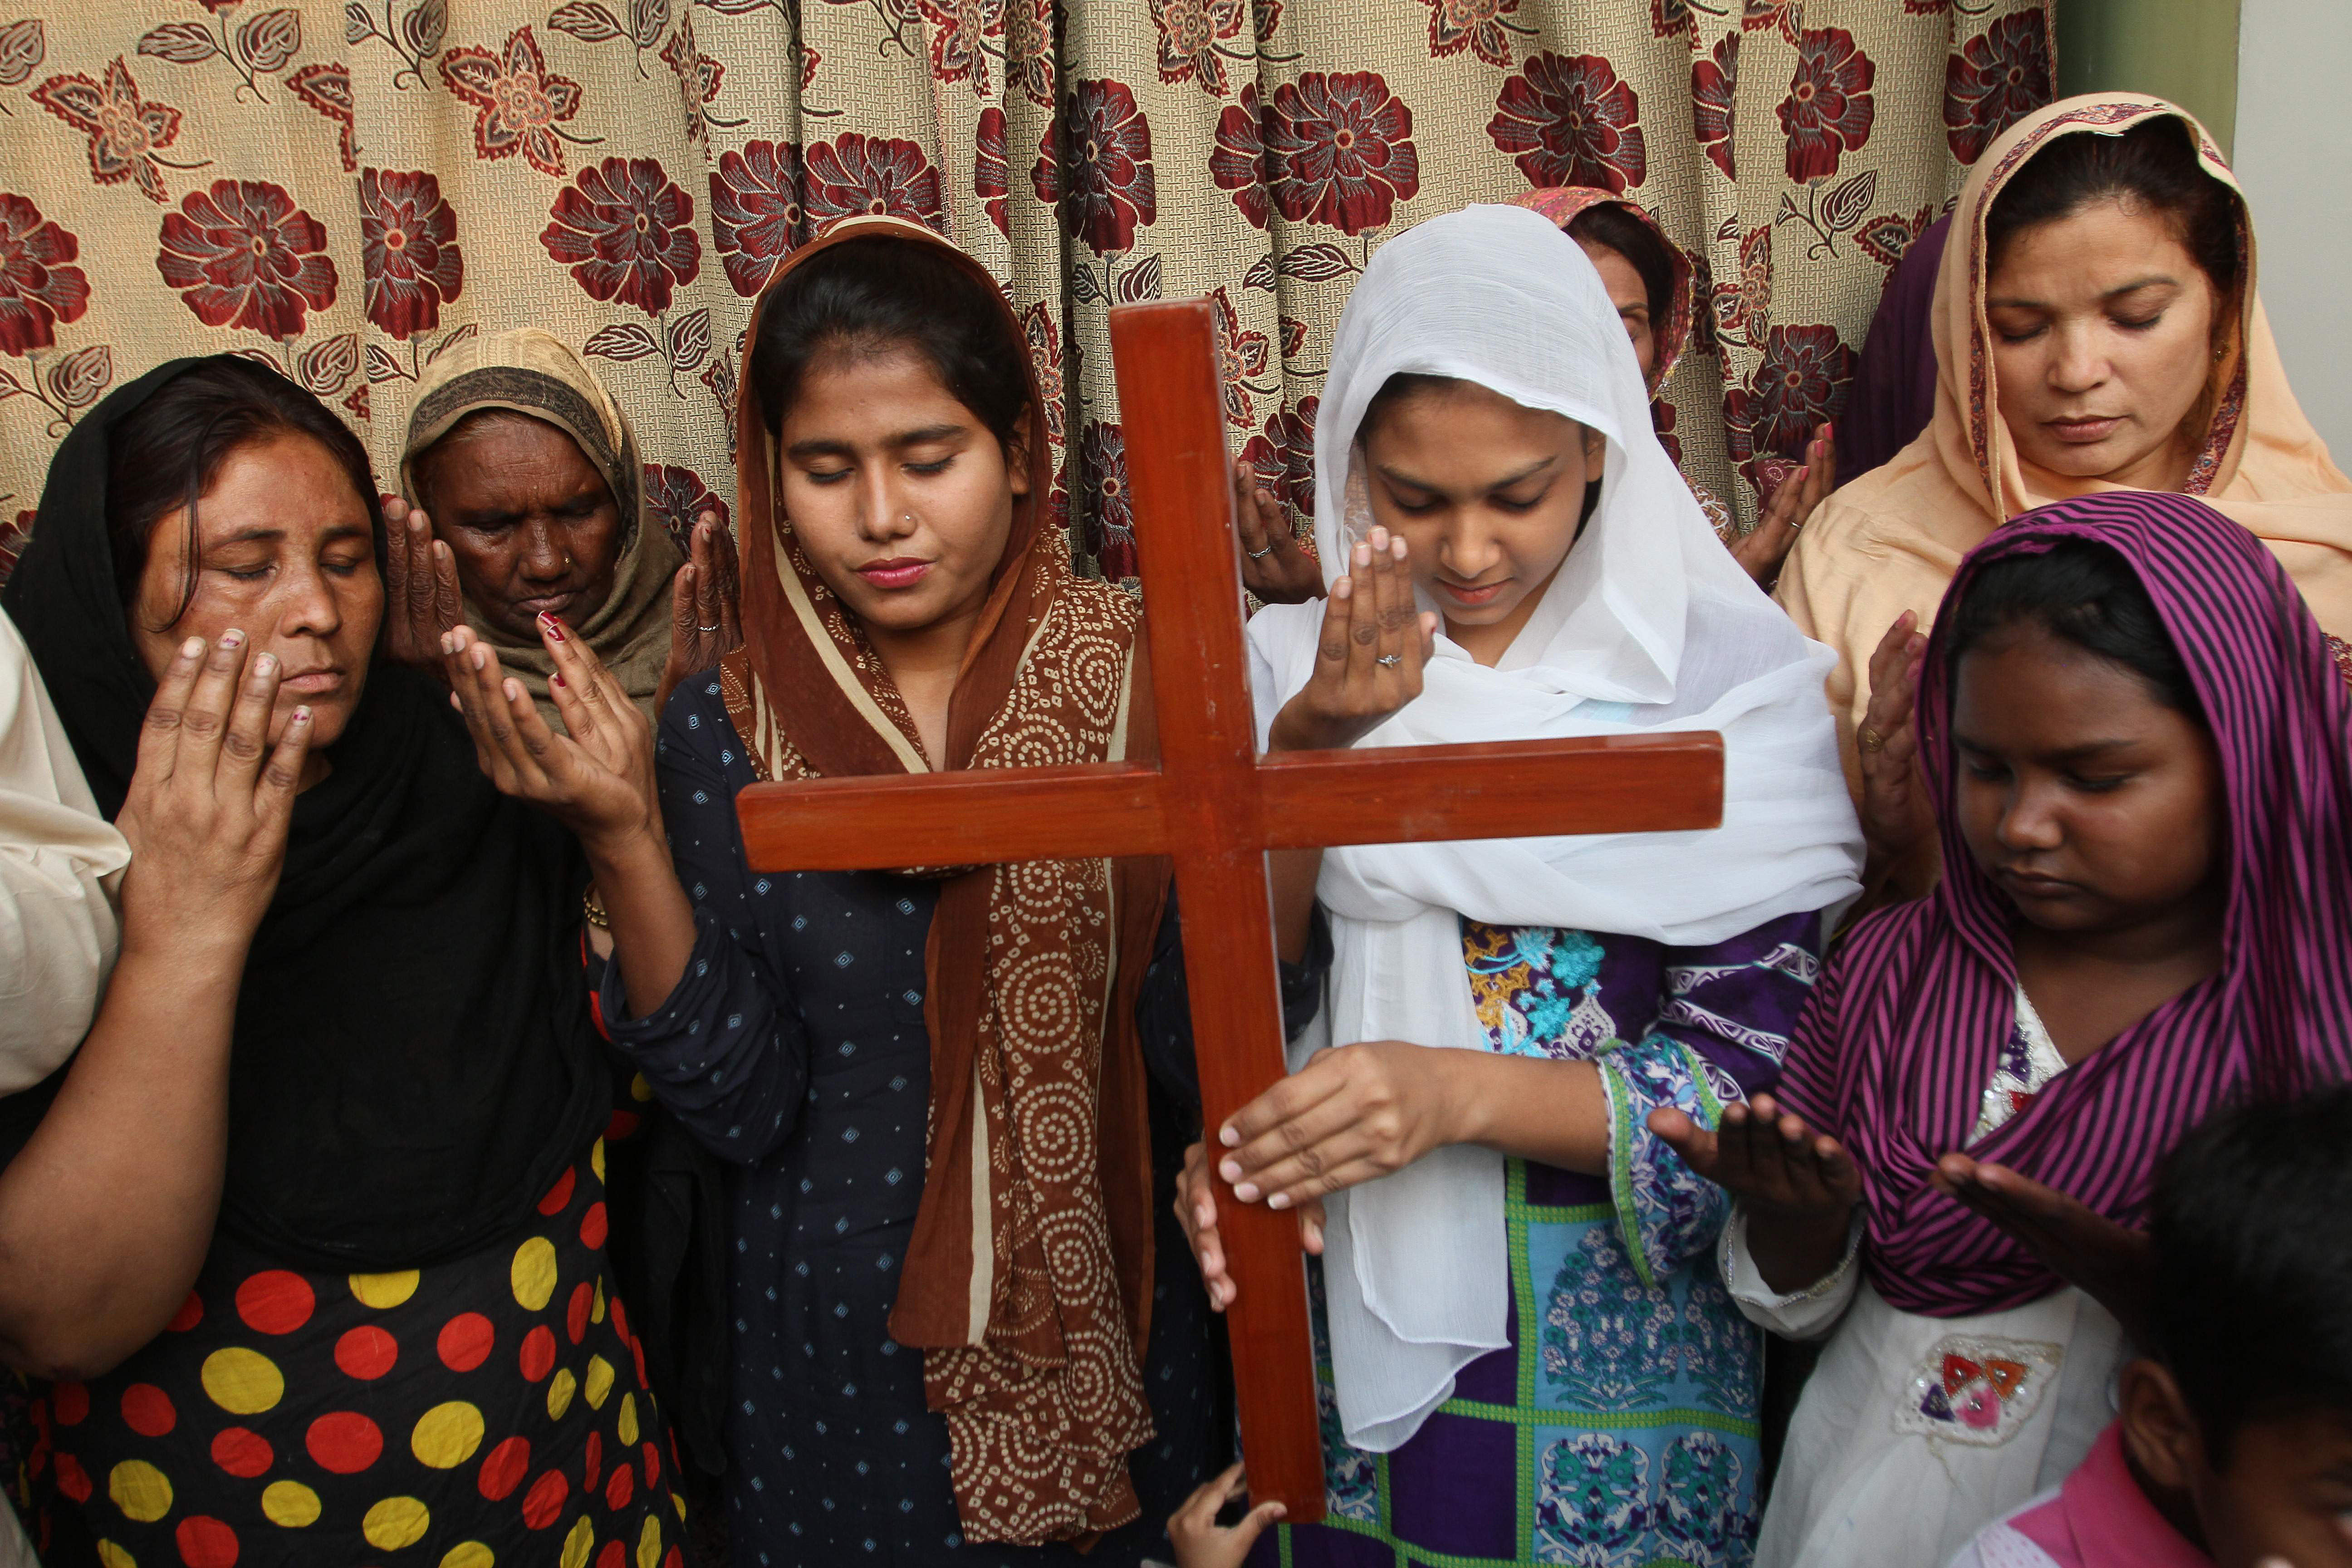 UK 'Won't Offer Asylum To Asia Bibi Amid Security Concerns'